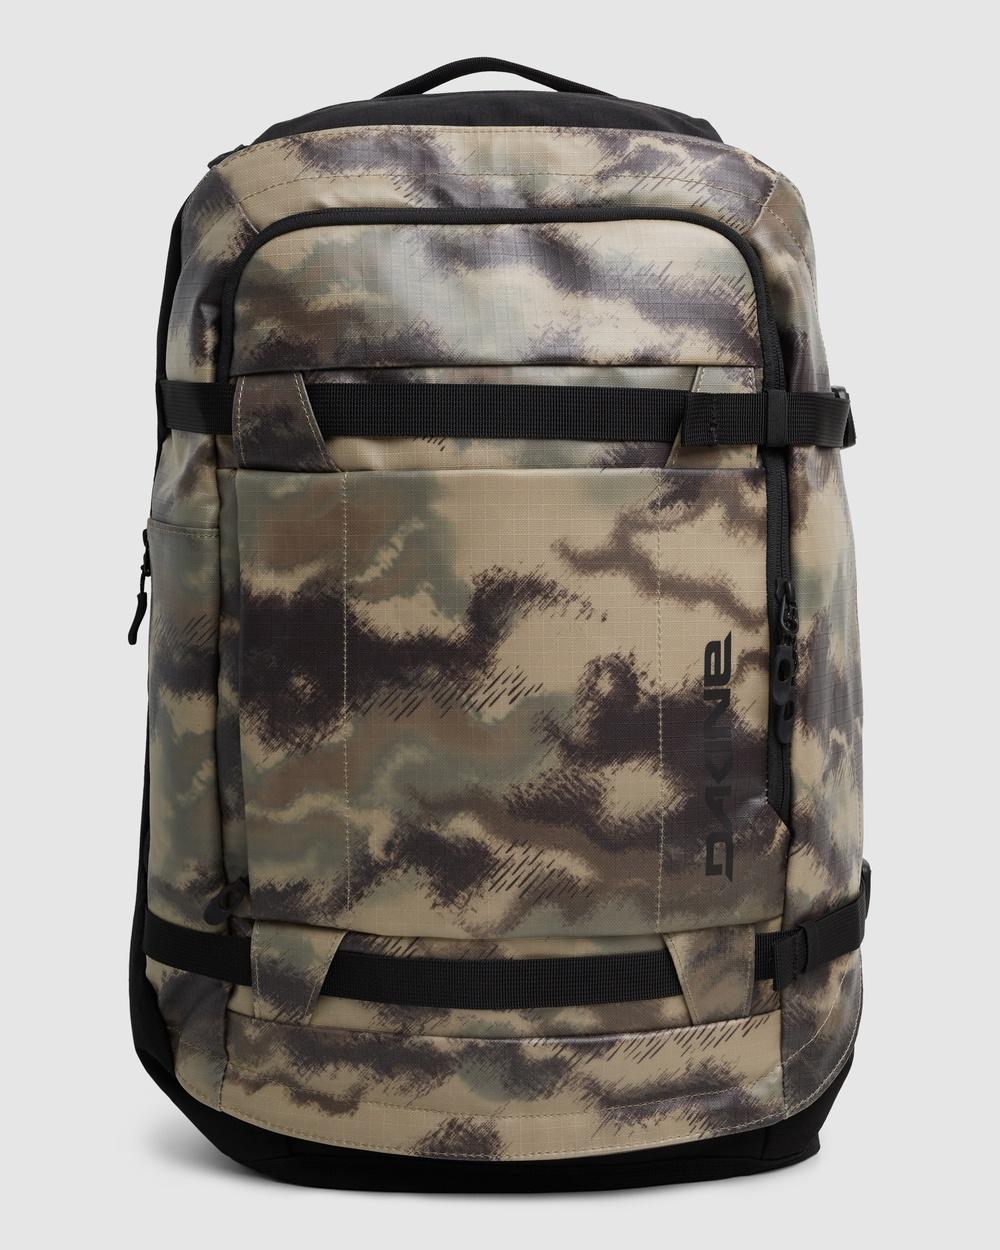 Dakine Ranger Travel 45 L Backpack Duffle Bags ASHCROFT CMO Australia